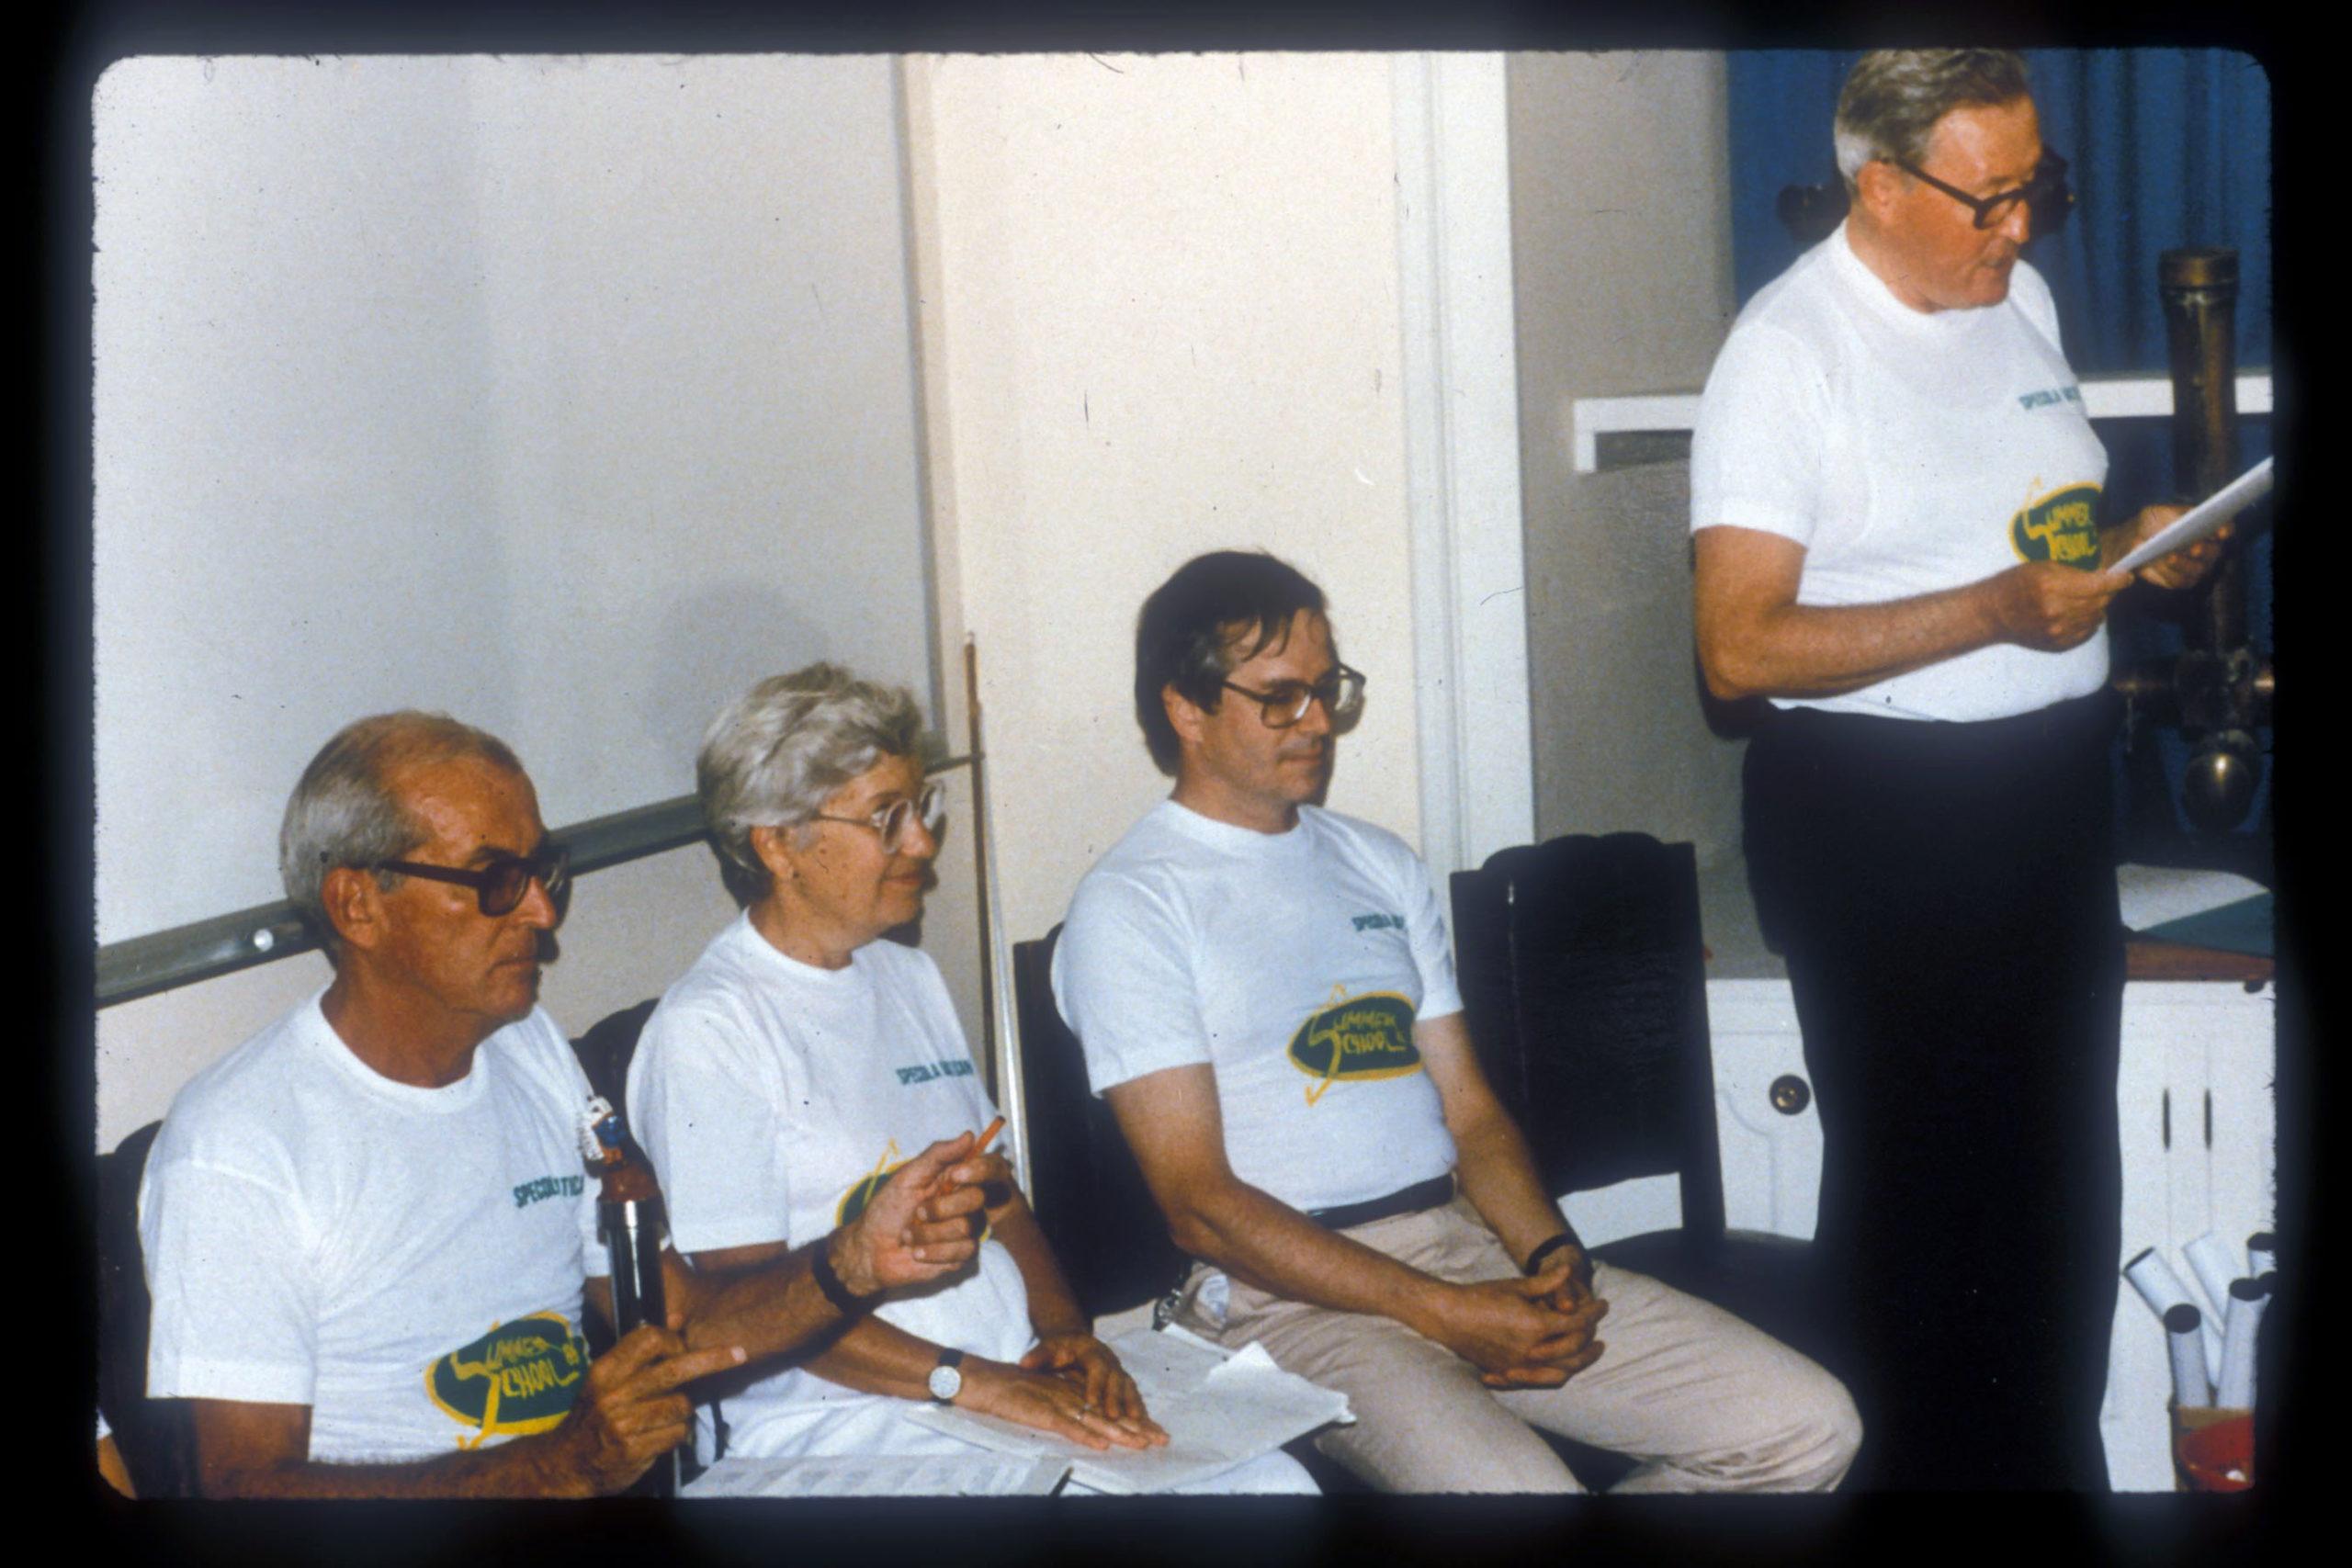 Vatican Observatory Summer School Team Members